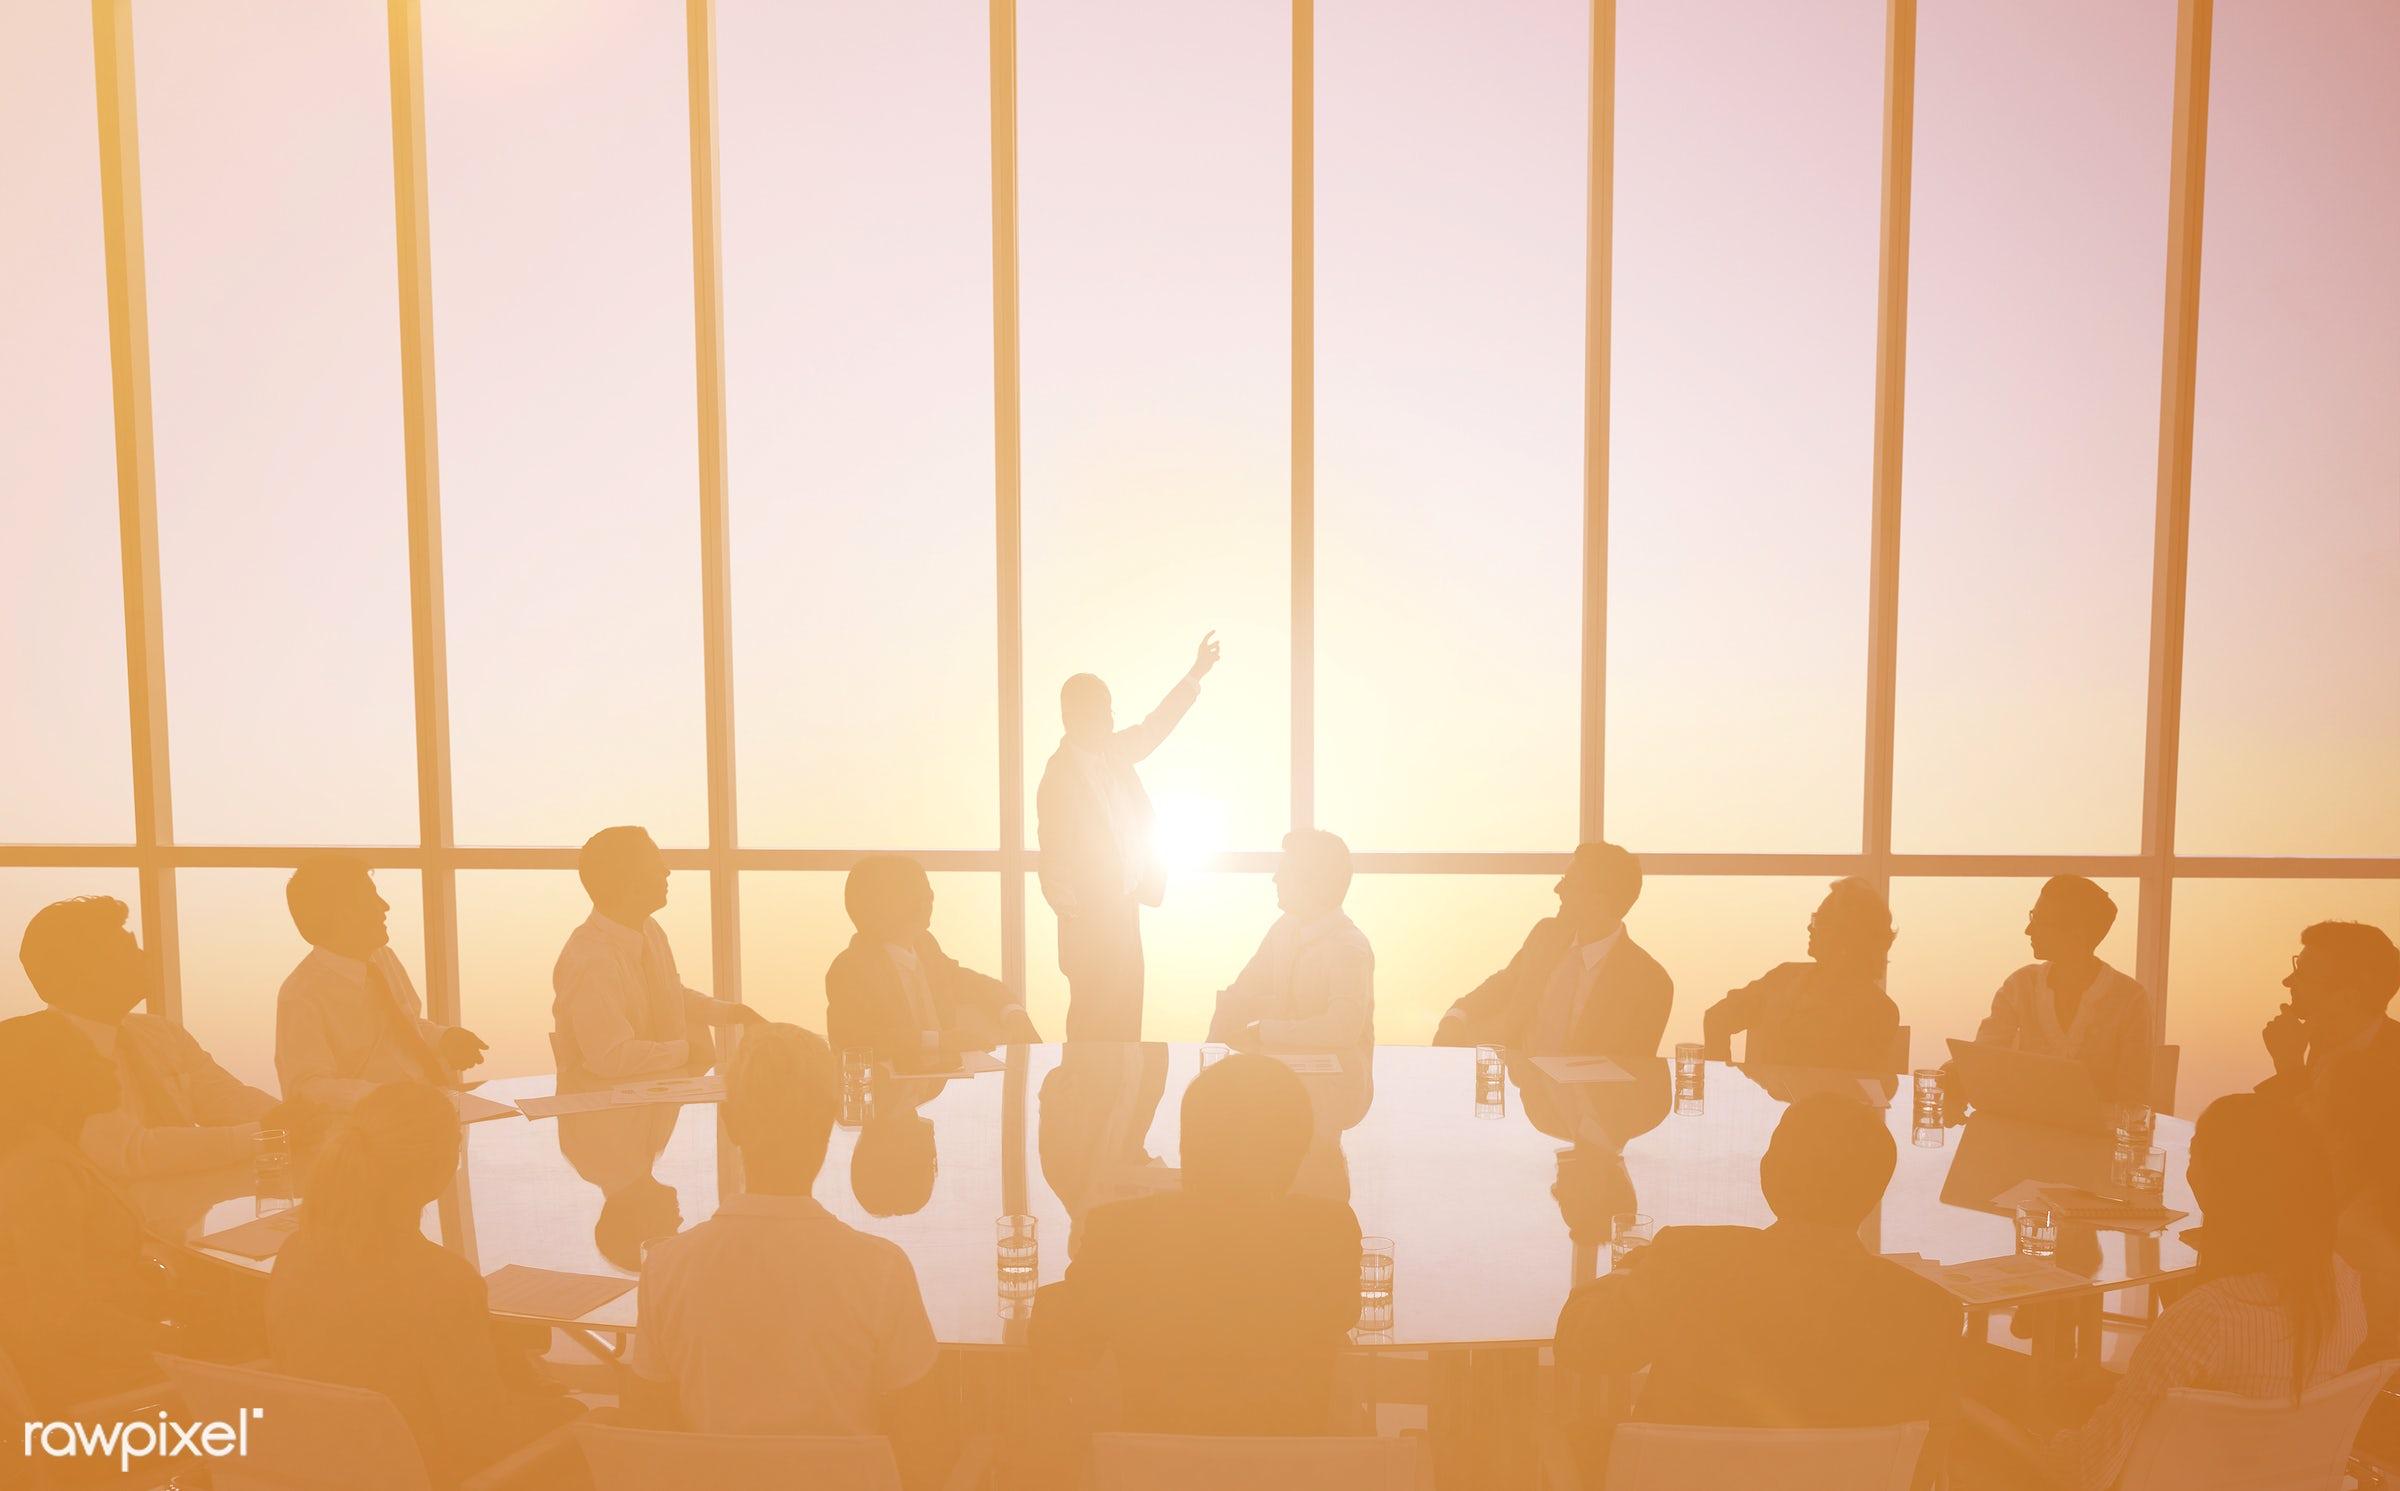 african descent, asian ethnicity, board room, brainstorming, building, business, business people, businessmen, businesswomen...